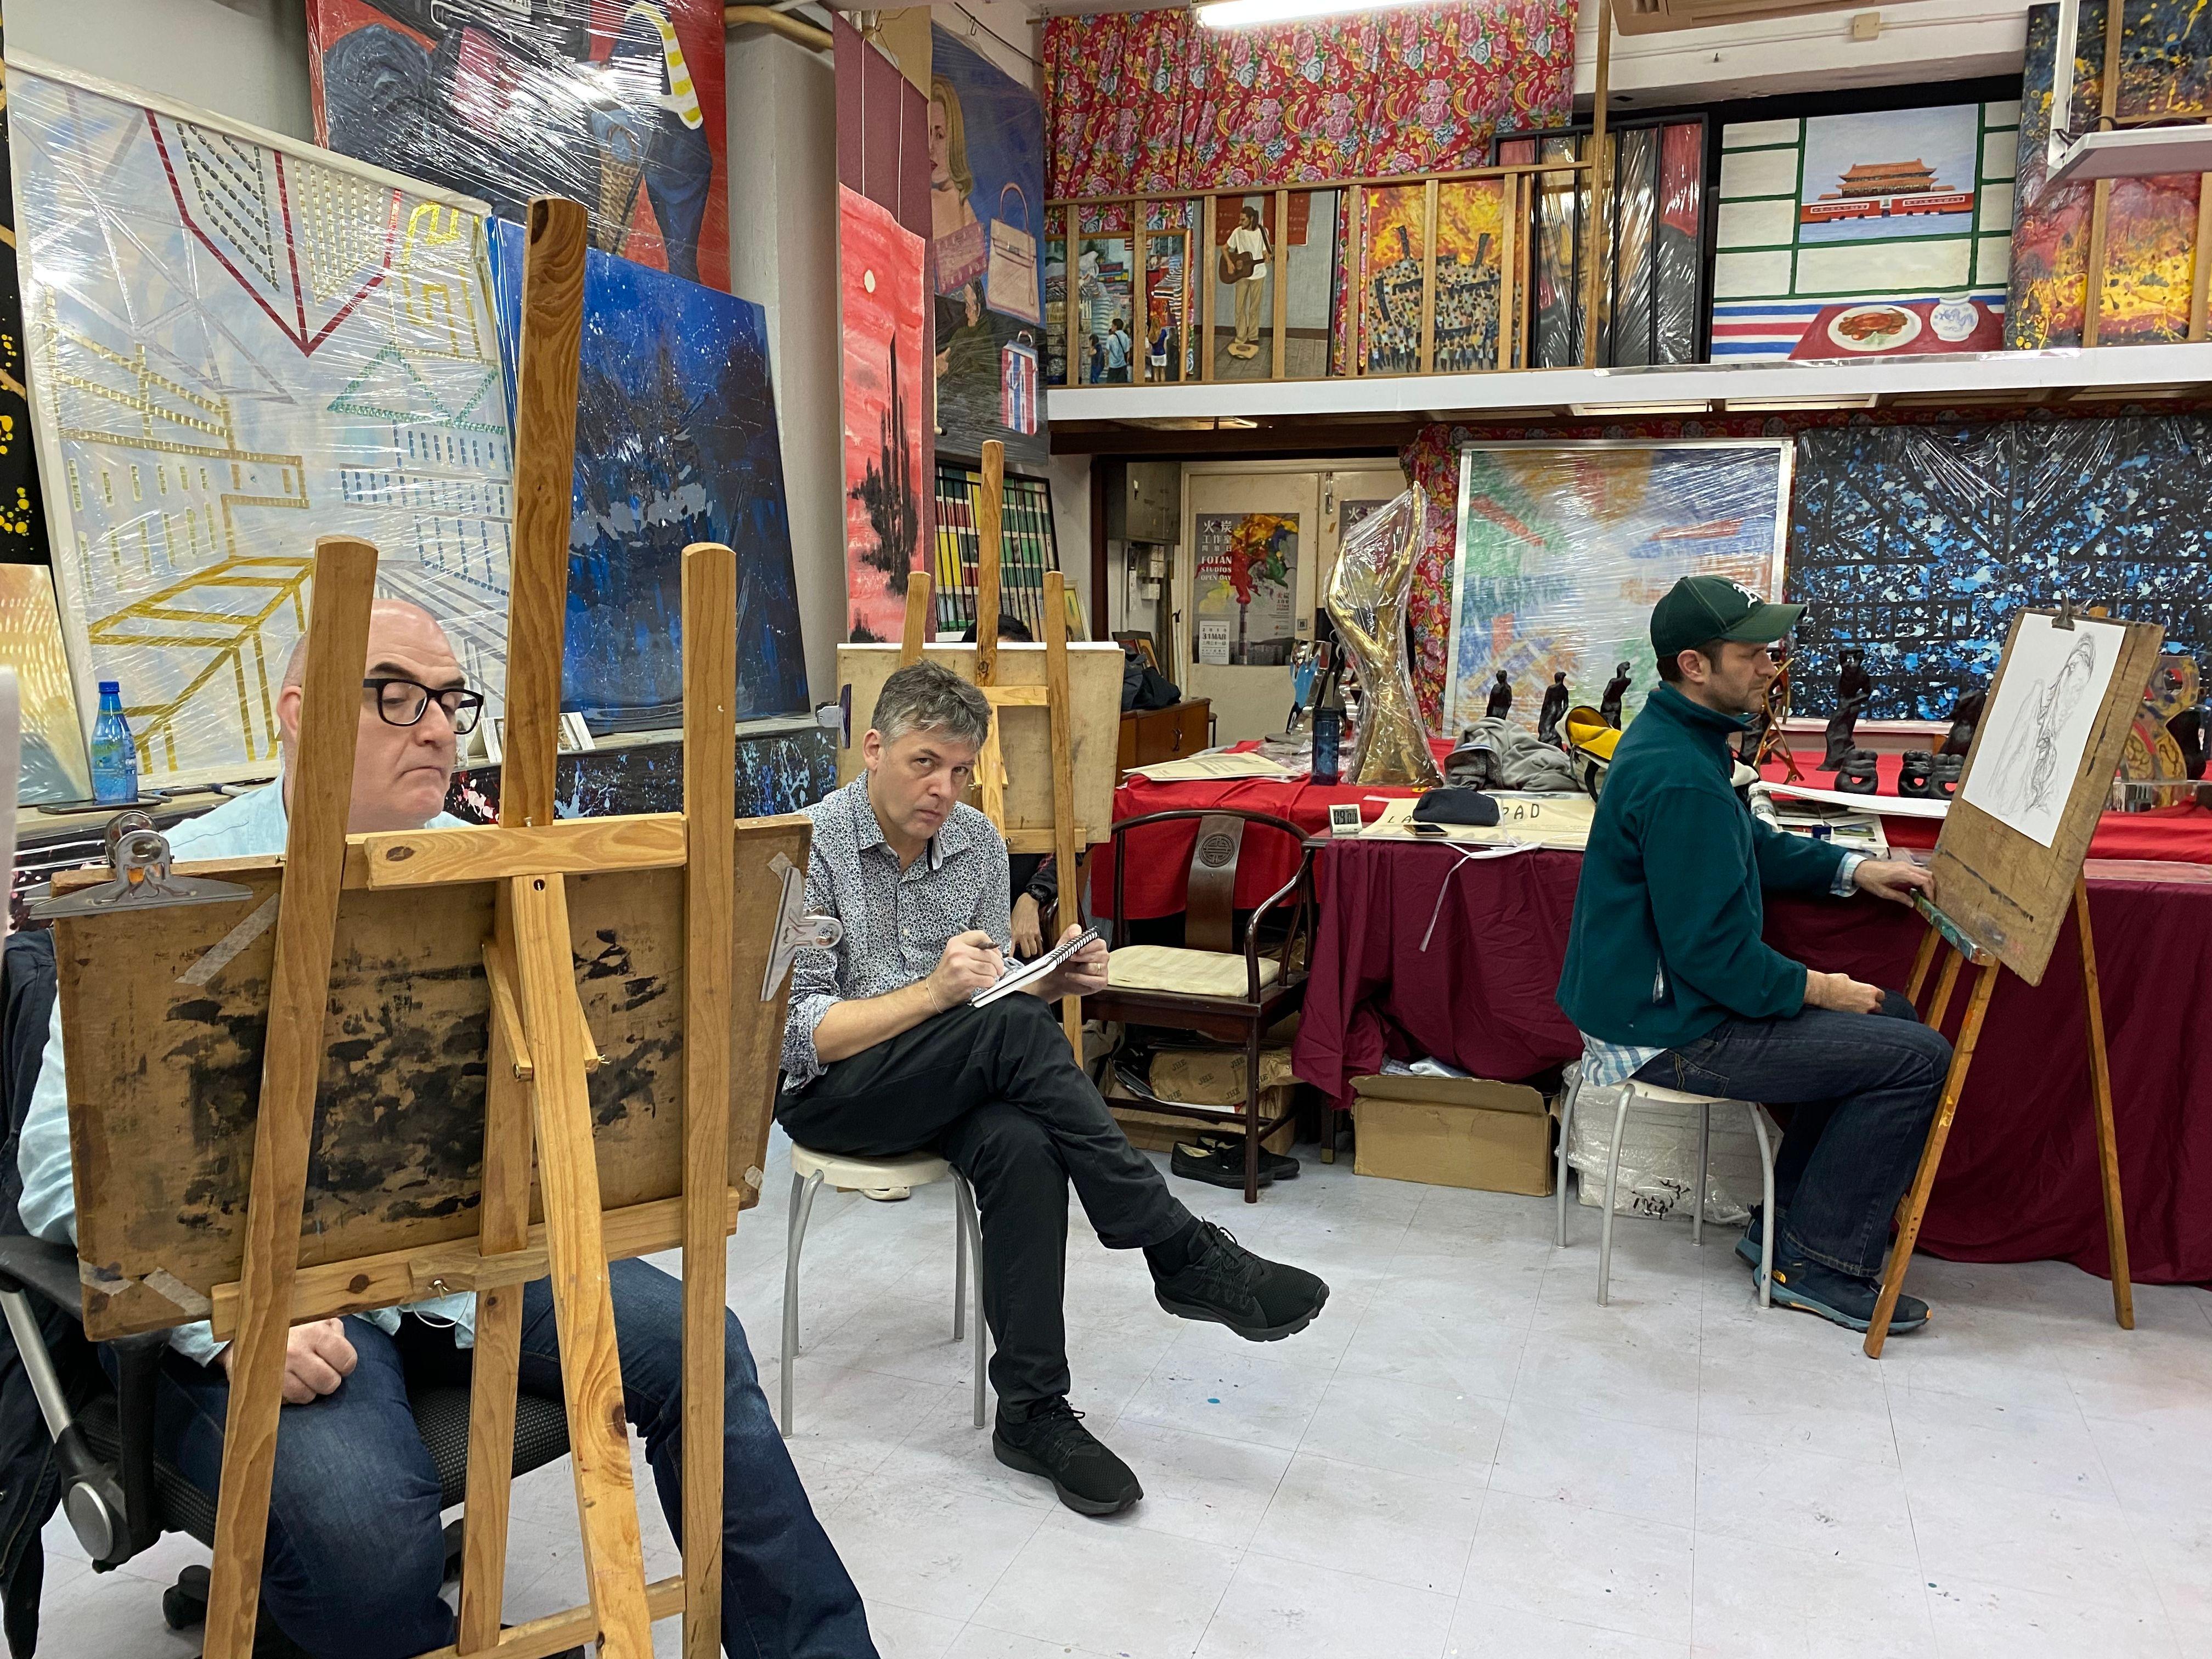 Hong Kong Art Meetup for Painting, Life Drawing & art events